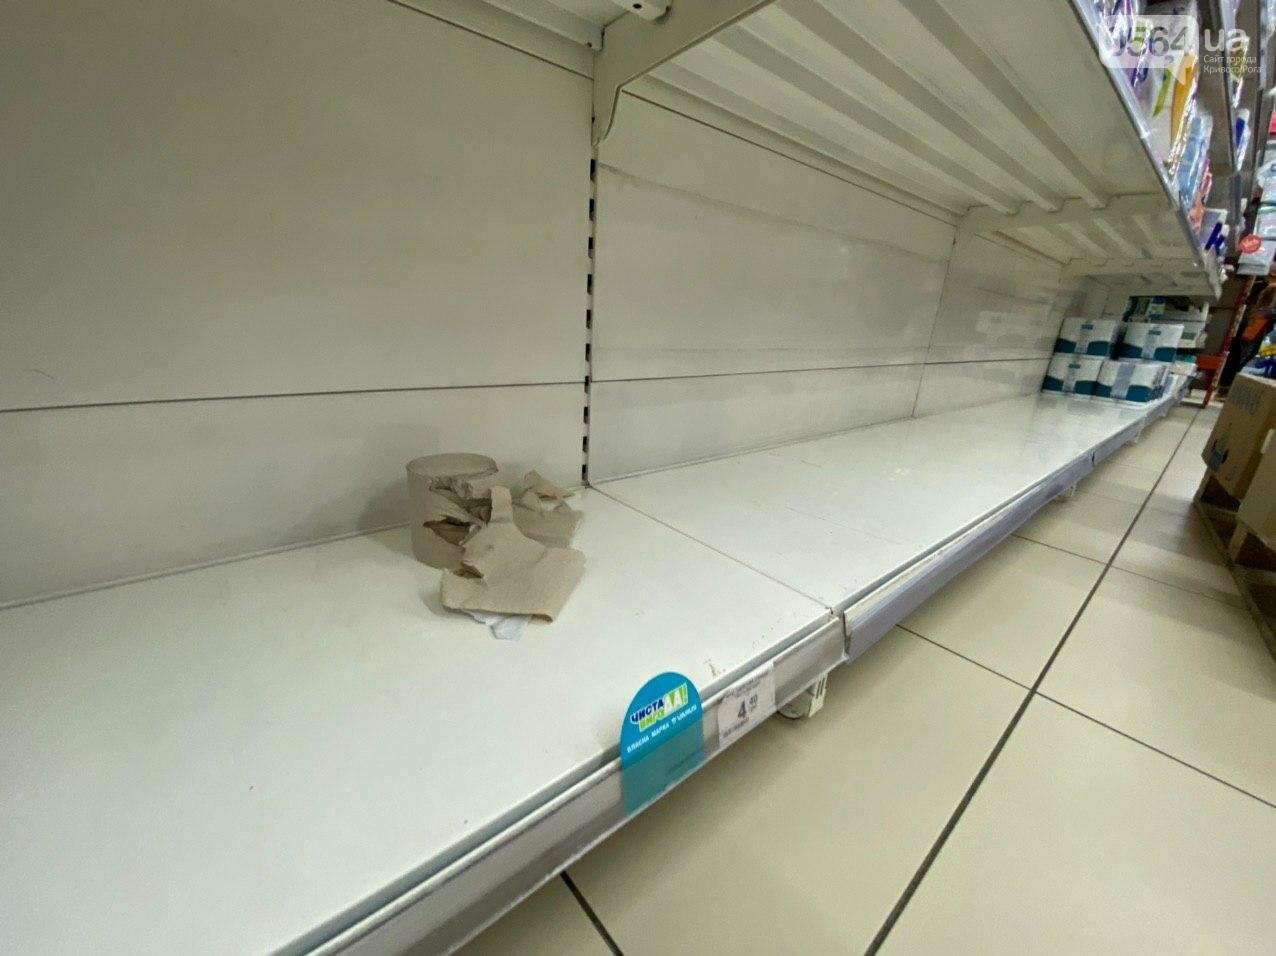 Туалетная бумага и гречка: что скупают криворожане во время карантина, - ФОТО , фото-14